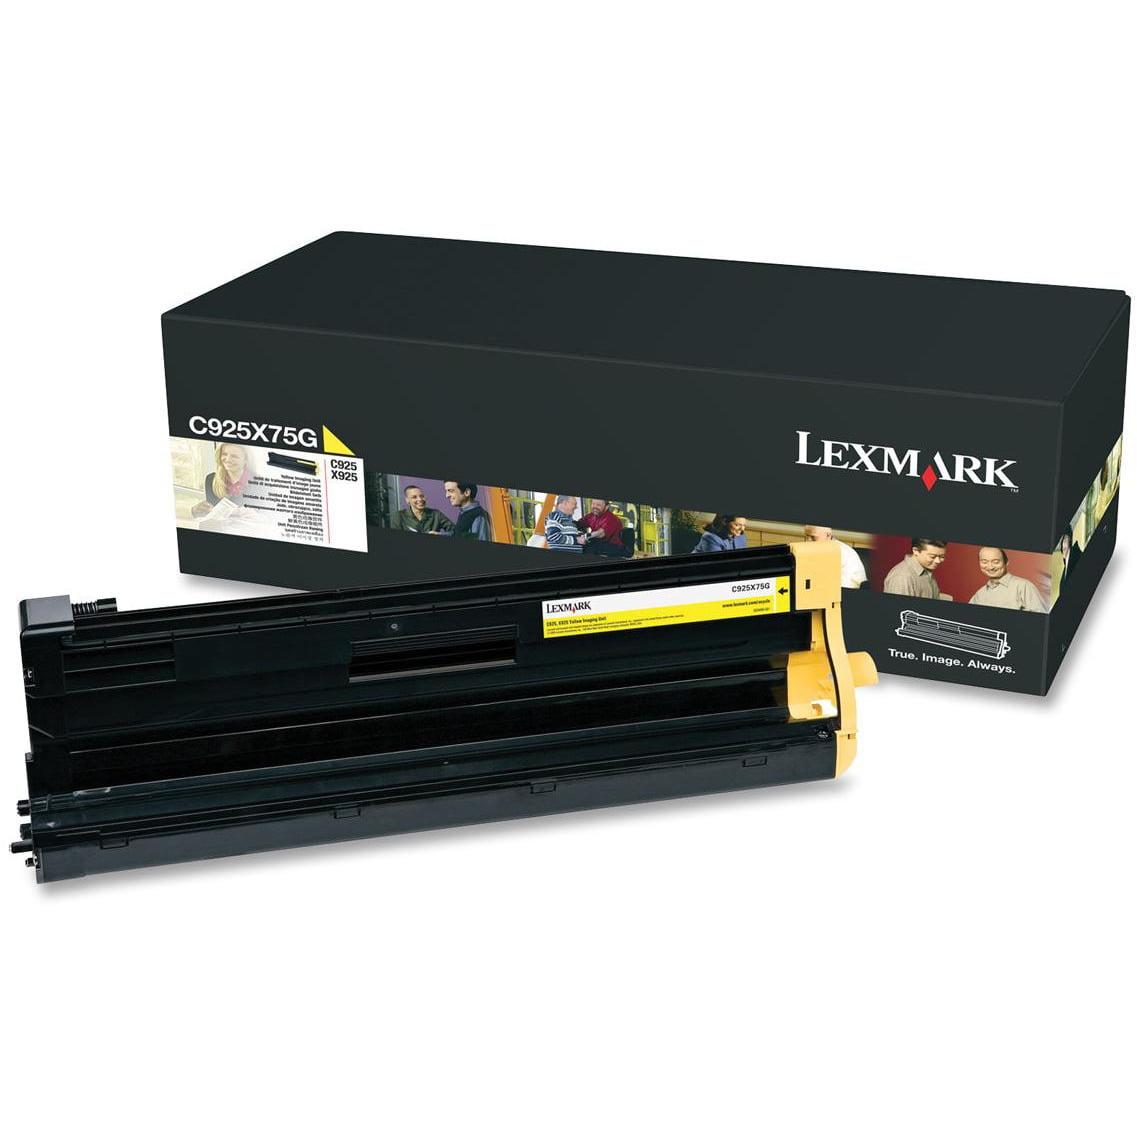 Lexmark, LEXC925X75G, C925 Imaging Unit, 1 Each